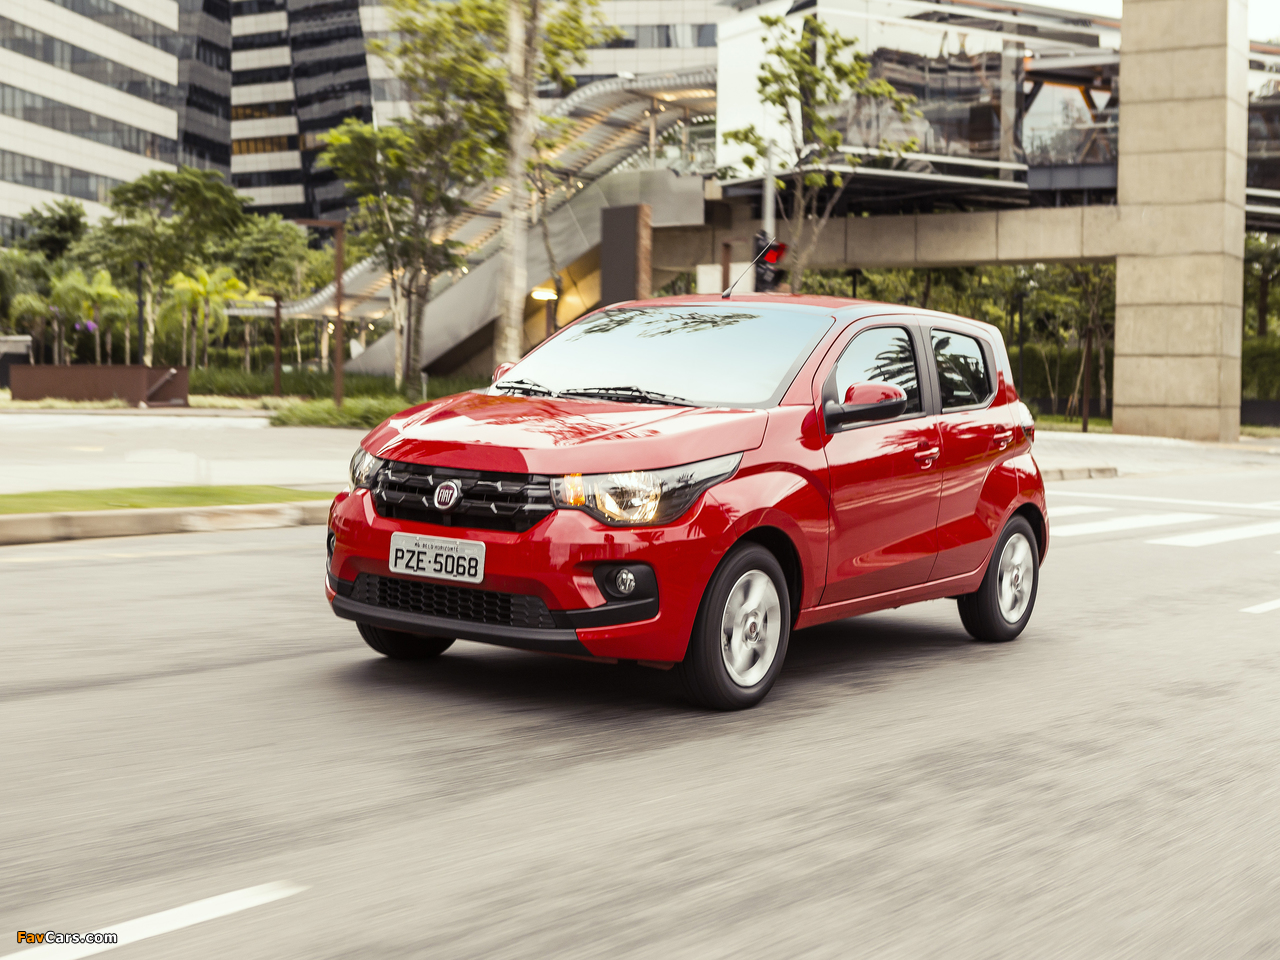 Fiat Mobi Drive GSR (344) 2017 pictures (1280 x 960)